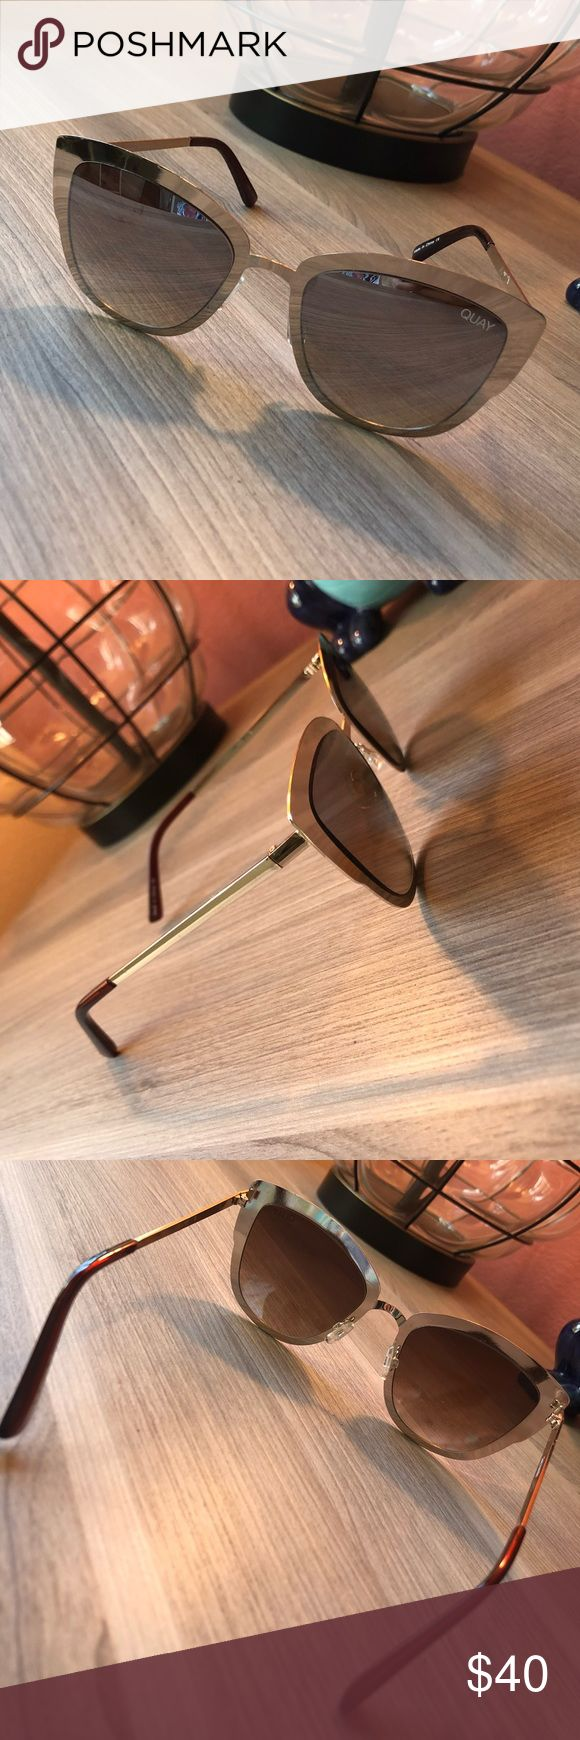 Quay Sunglasses Lightweight sunglasses Quay Australia Accessories Sunglasses